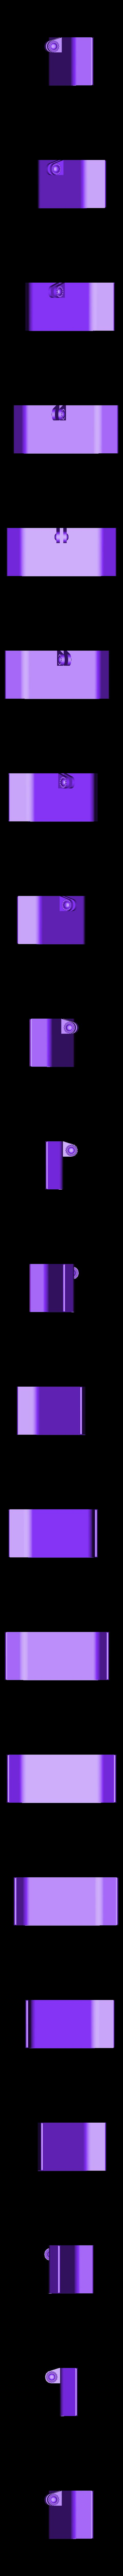 shovel.stl Download free STL file Shovel DLC for SMARS • Design to 3D print, Tuitxy